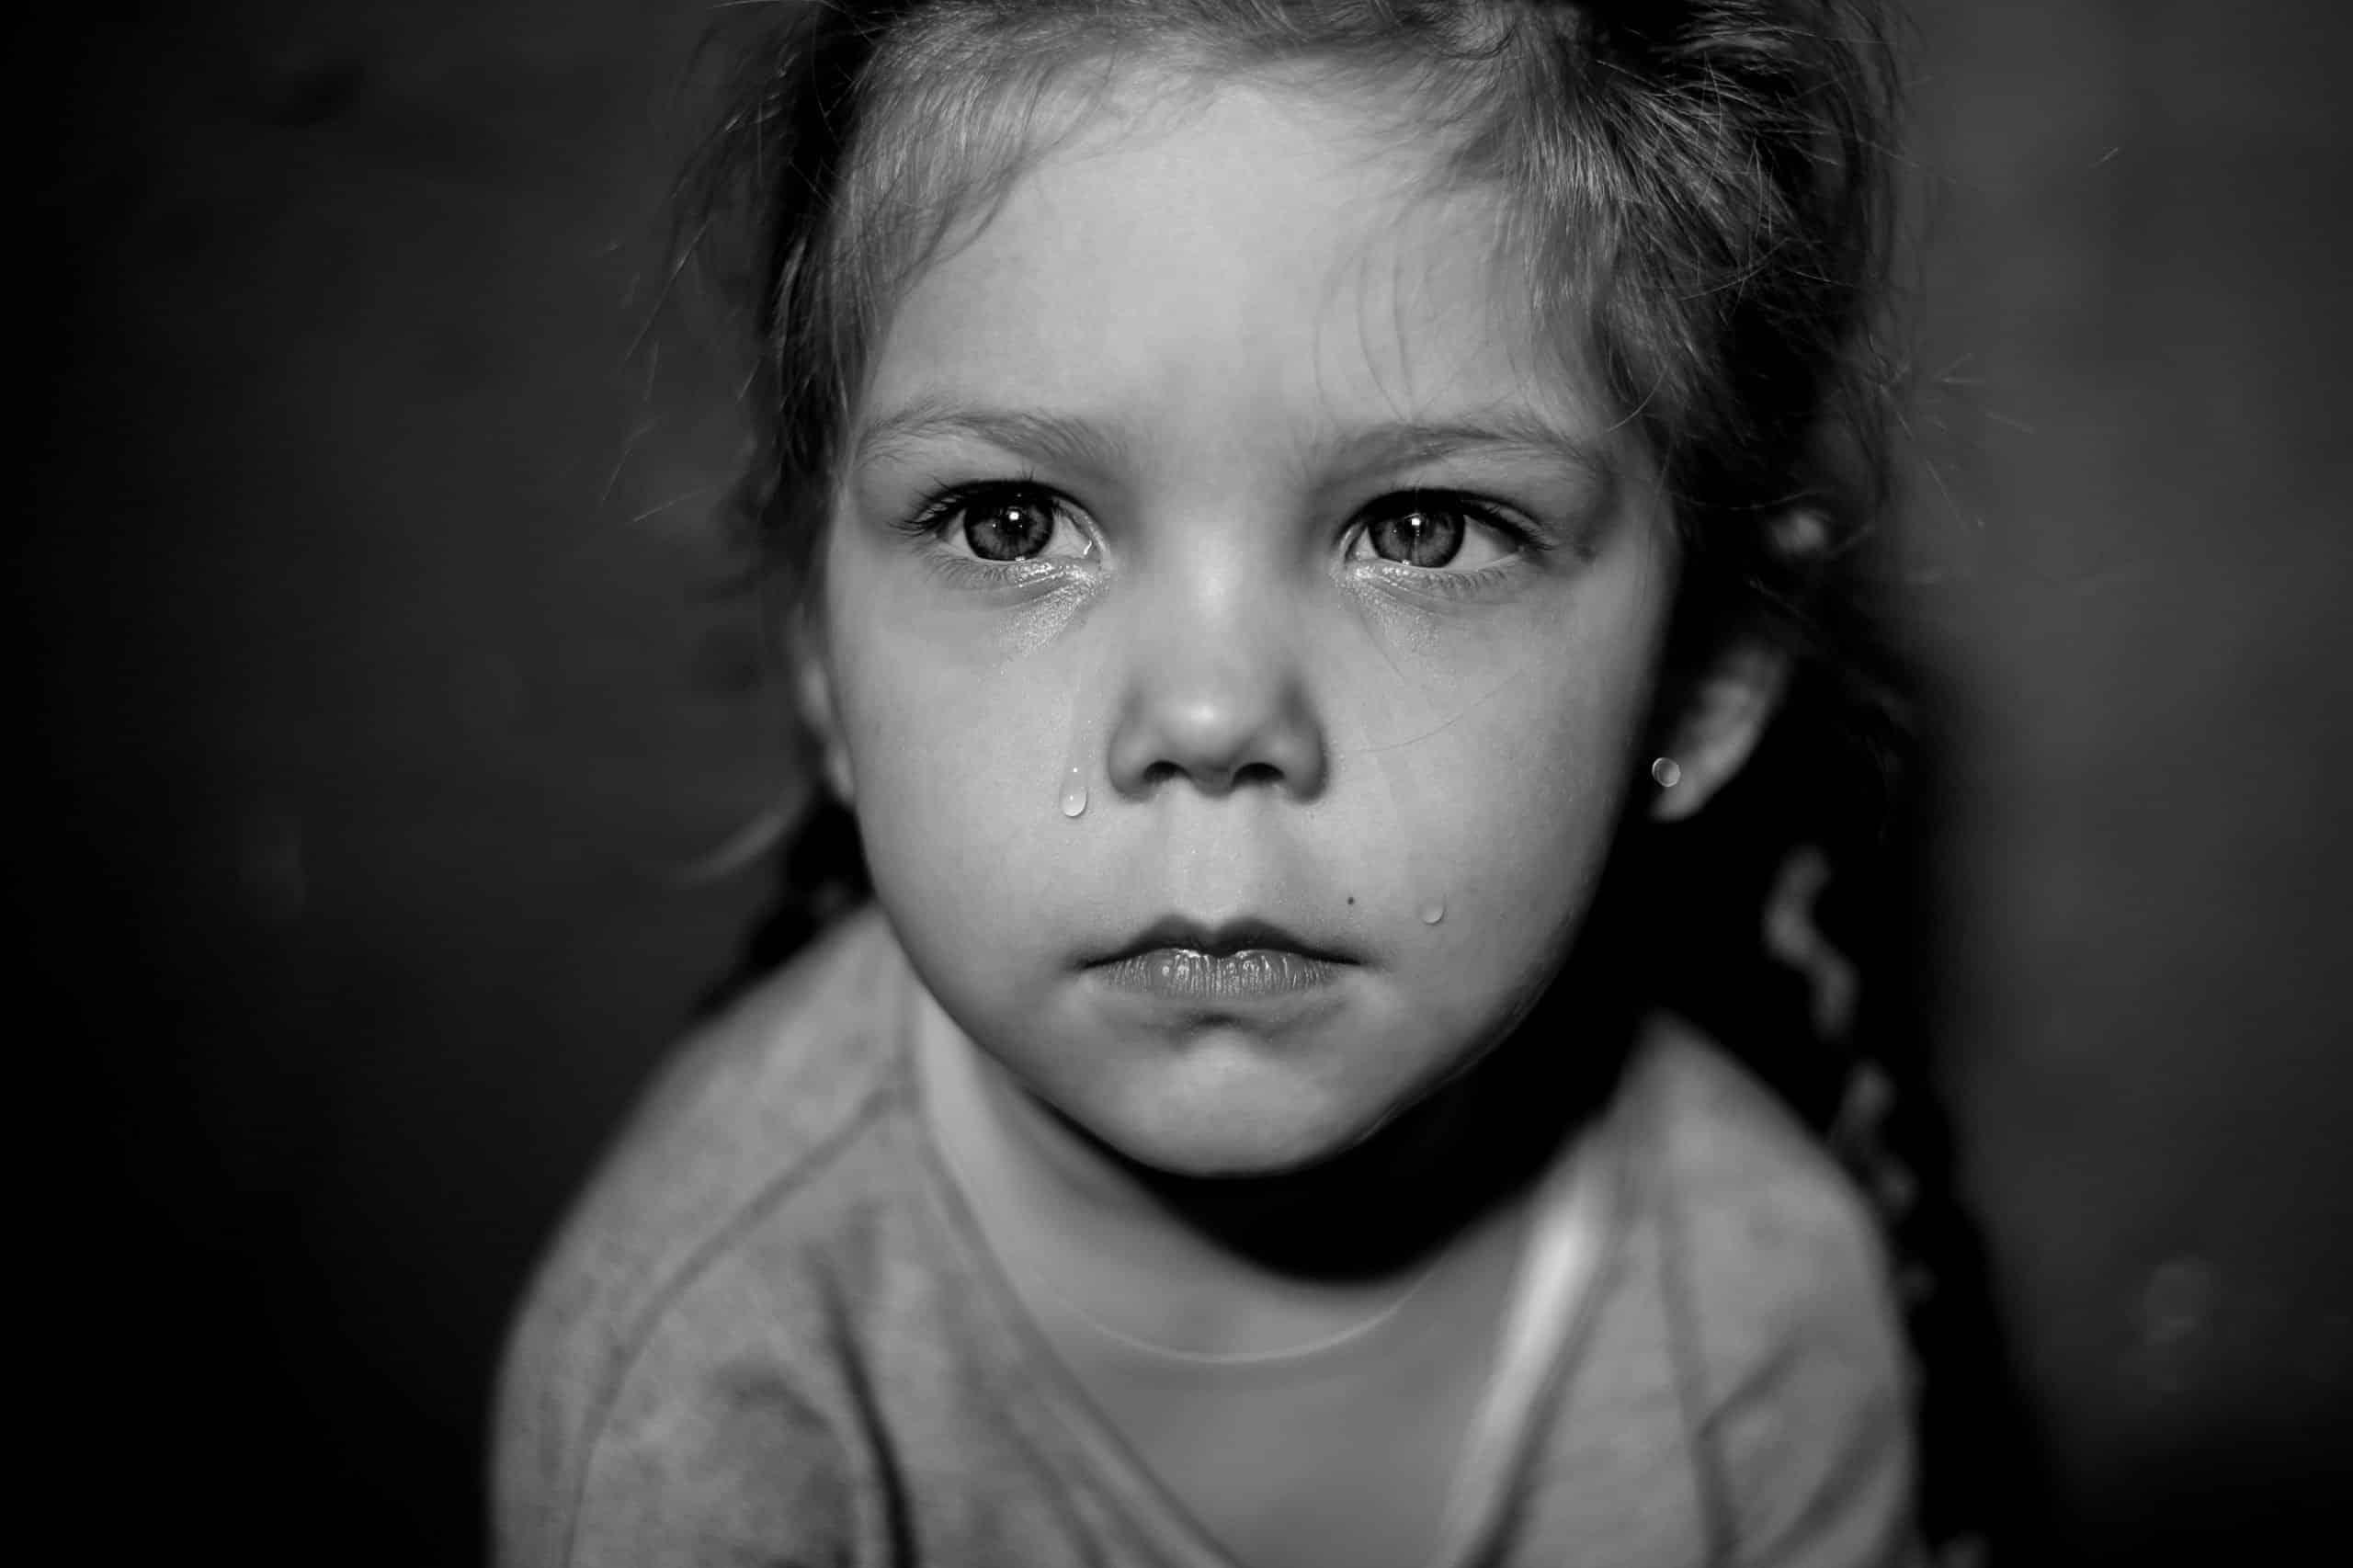 Childhood Emotional Neglect